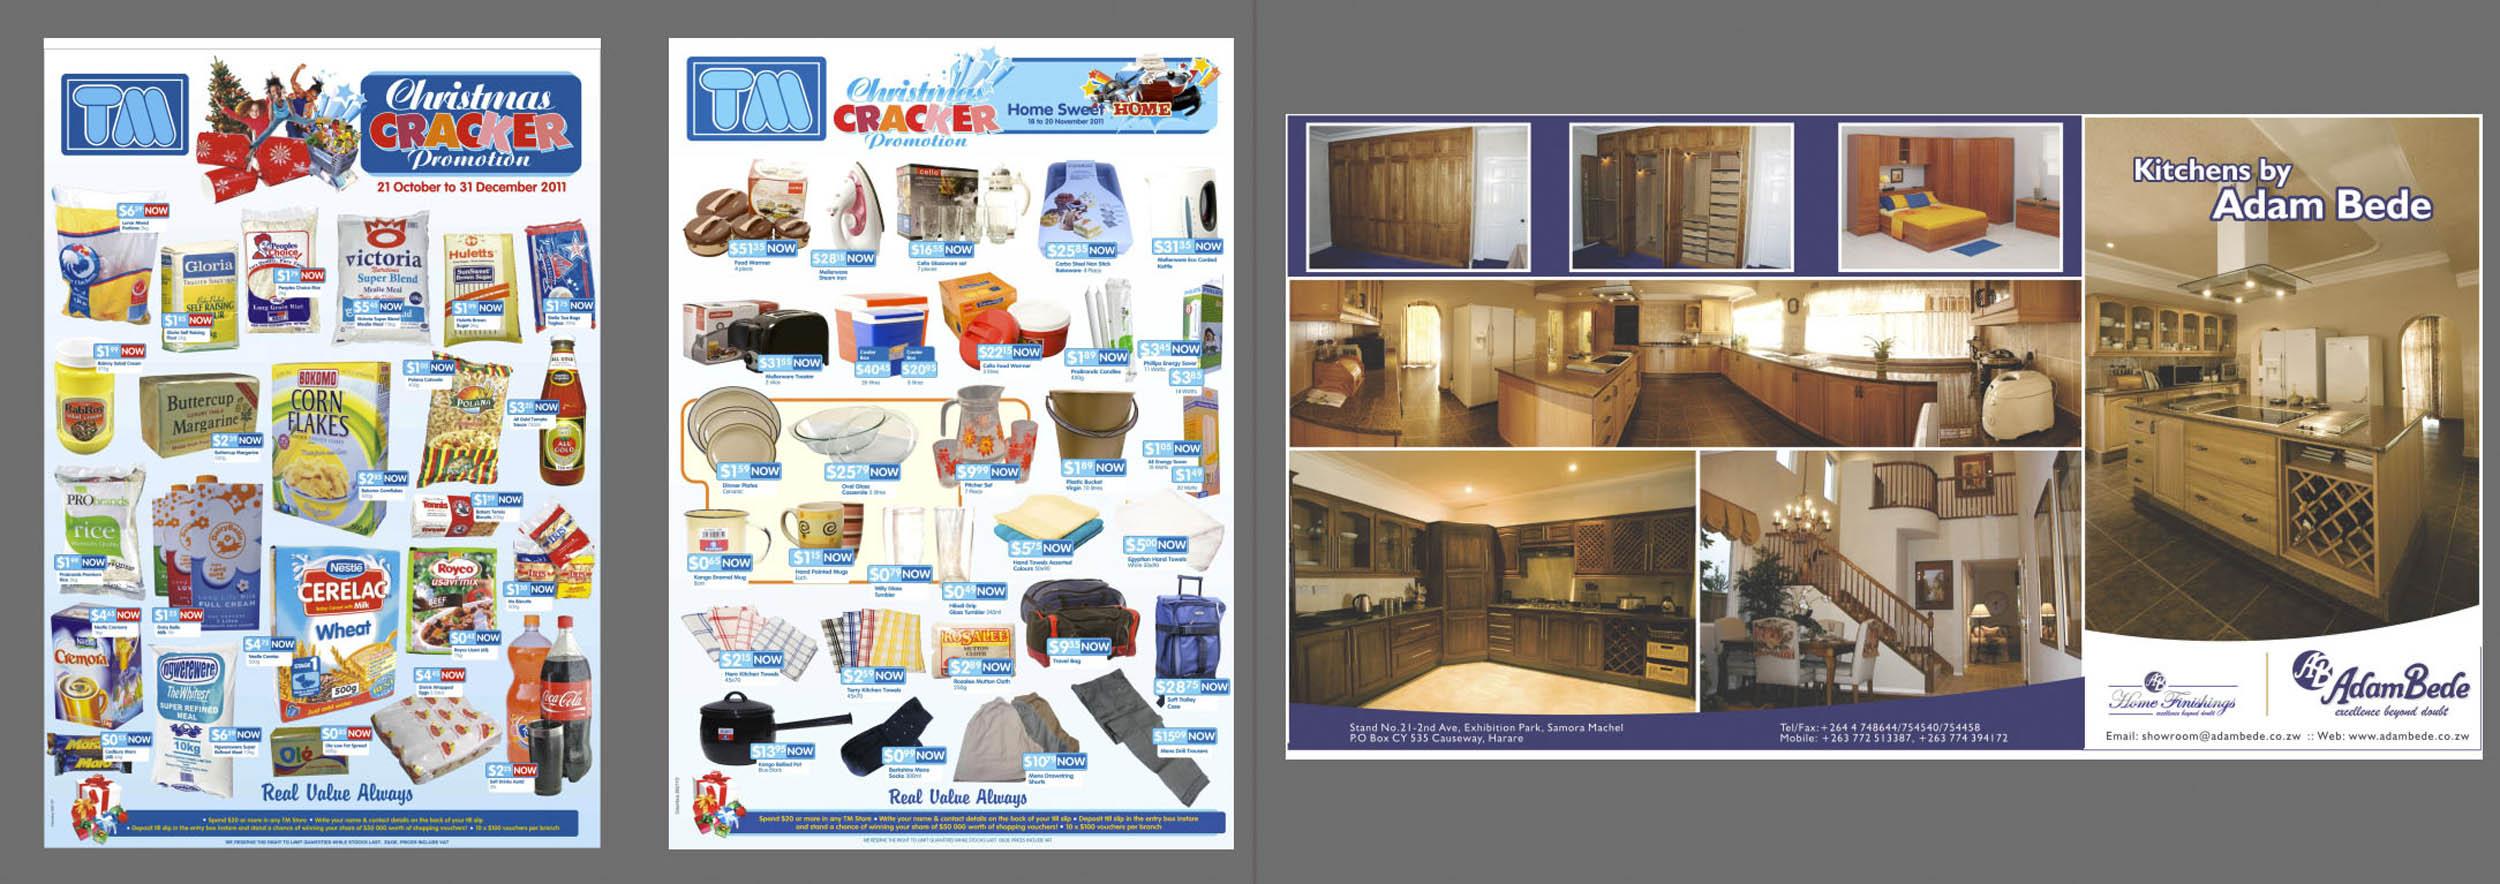 Corporate visual portfolio 7&8.jpg